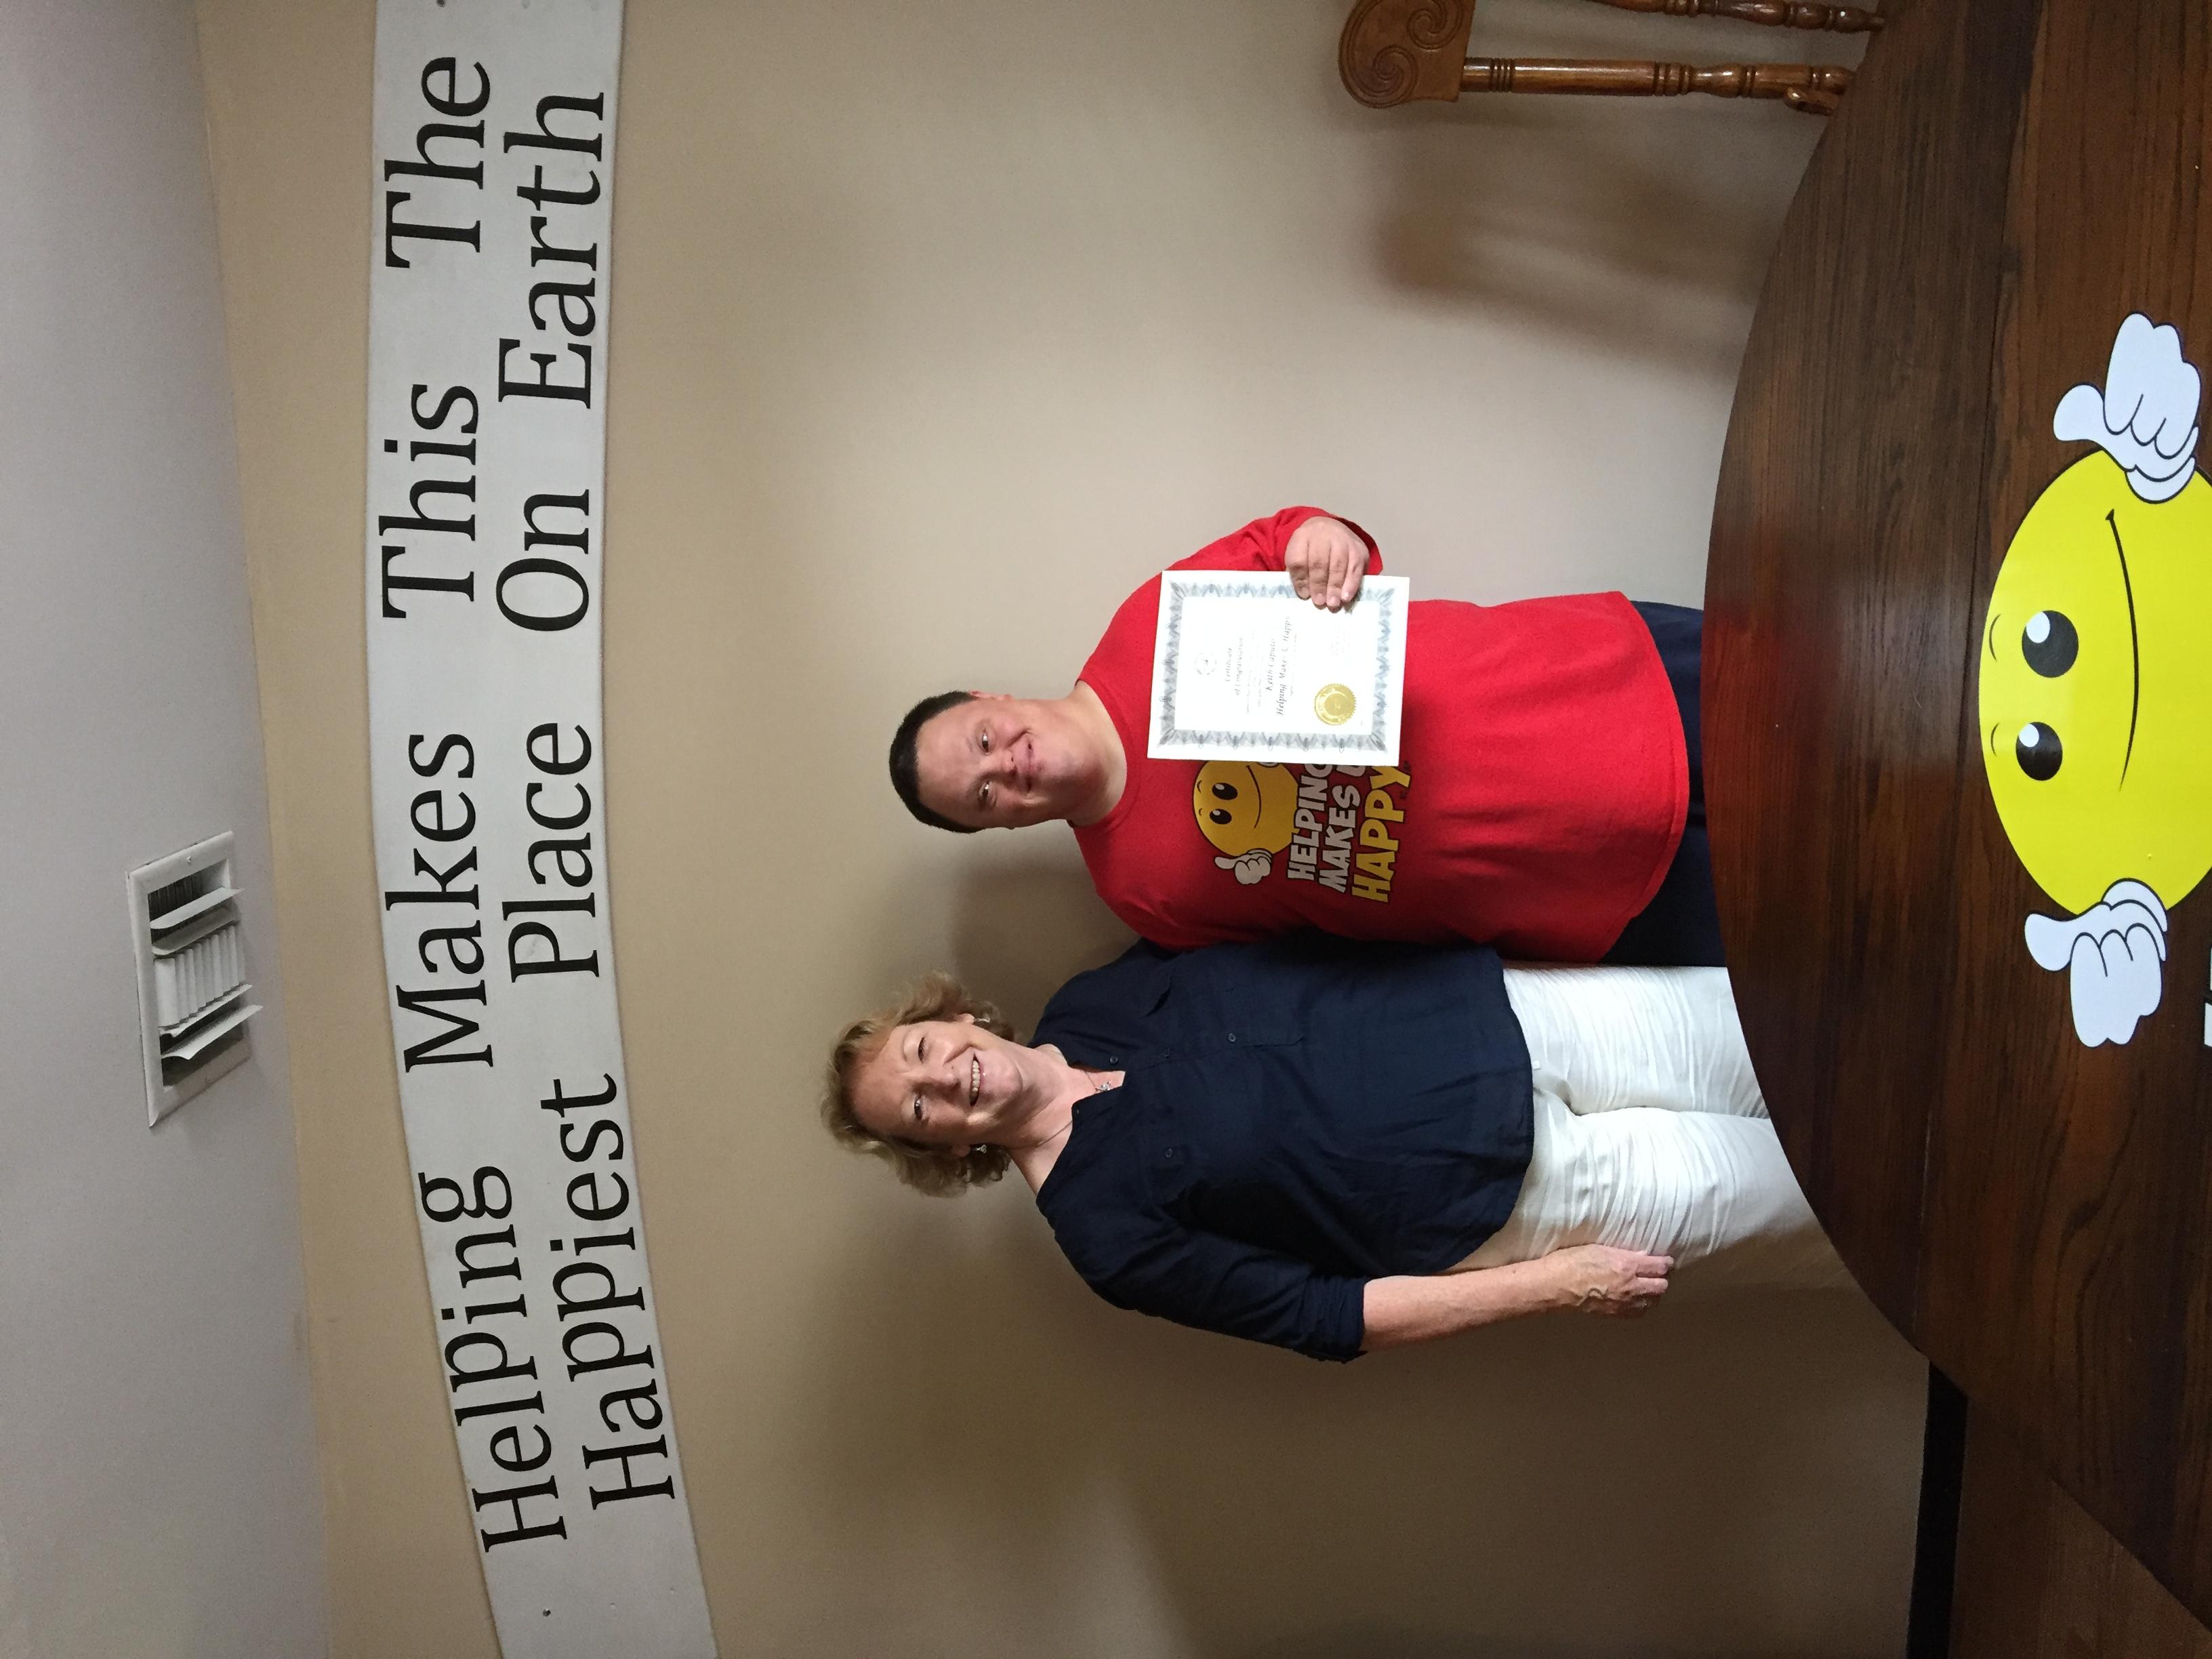 With Legislator Kate Browning